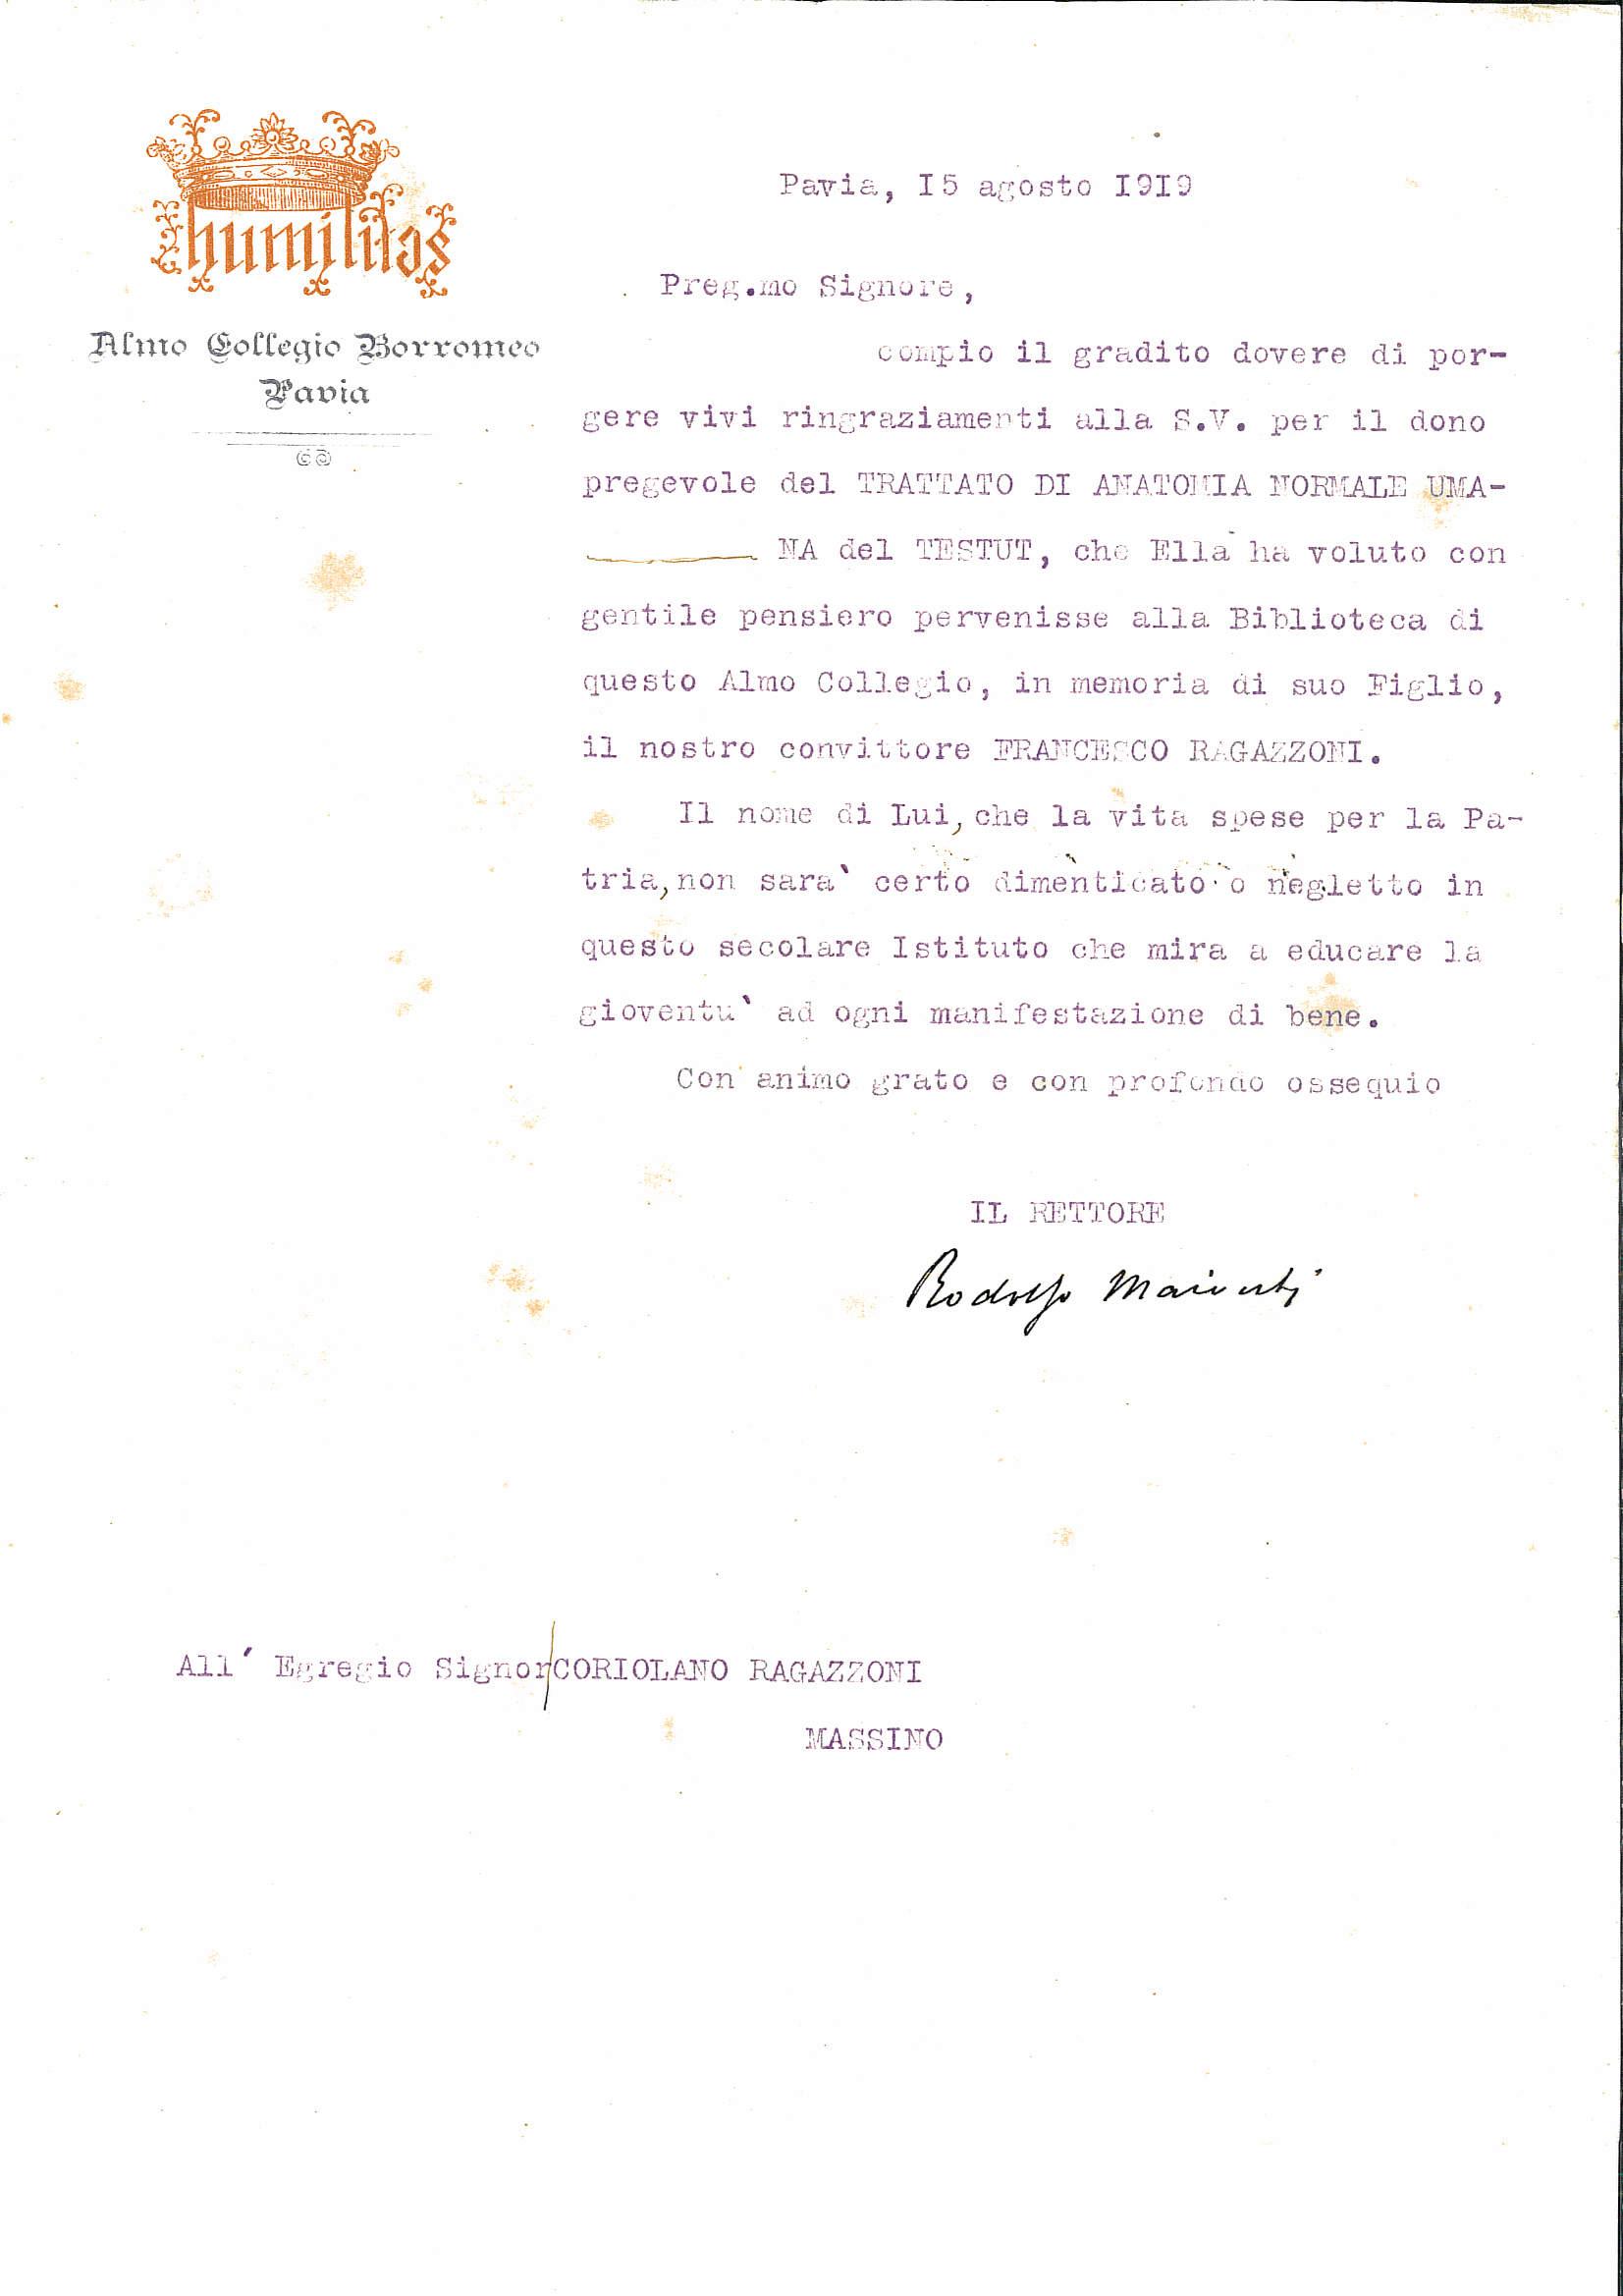 Almo Collegio Borromeo Pavia Spigolature D Archivio